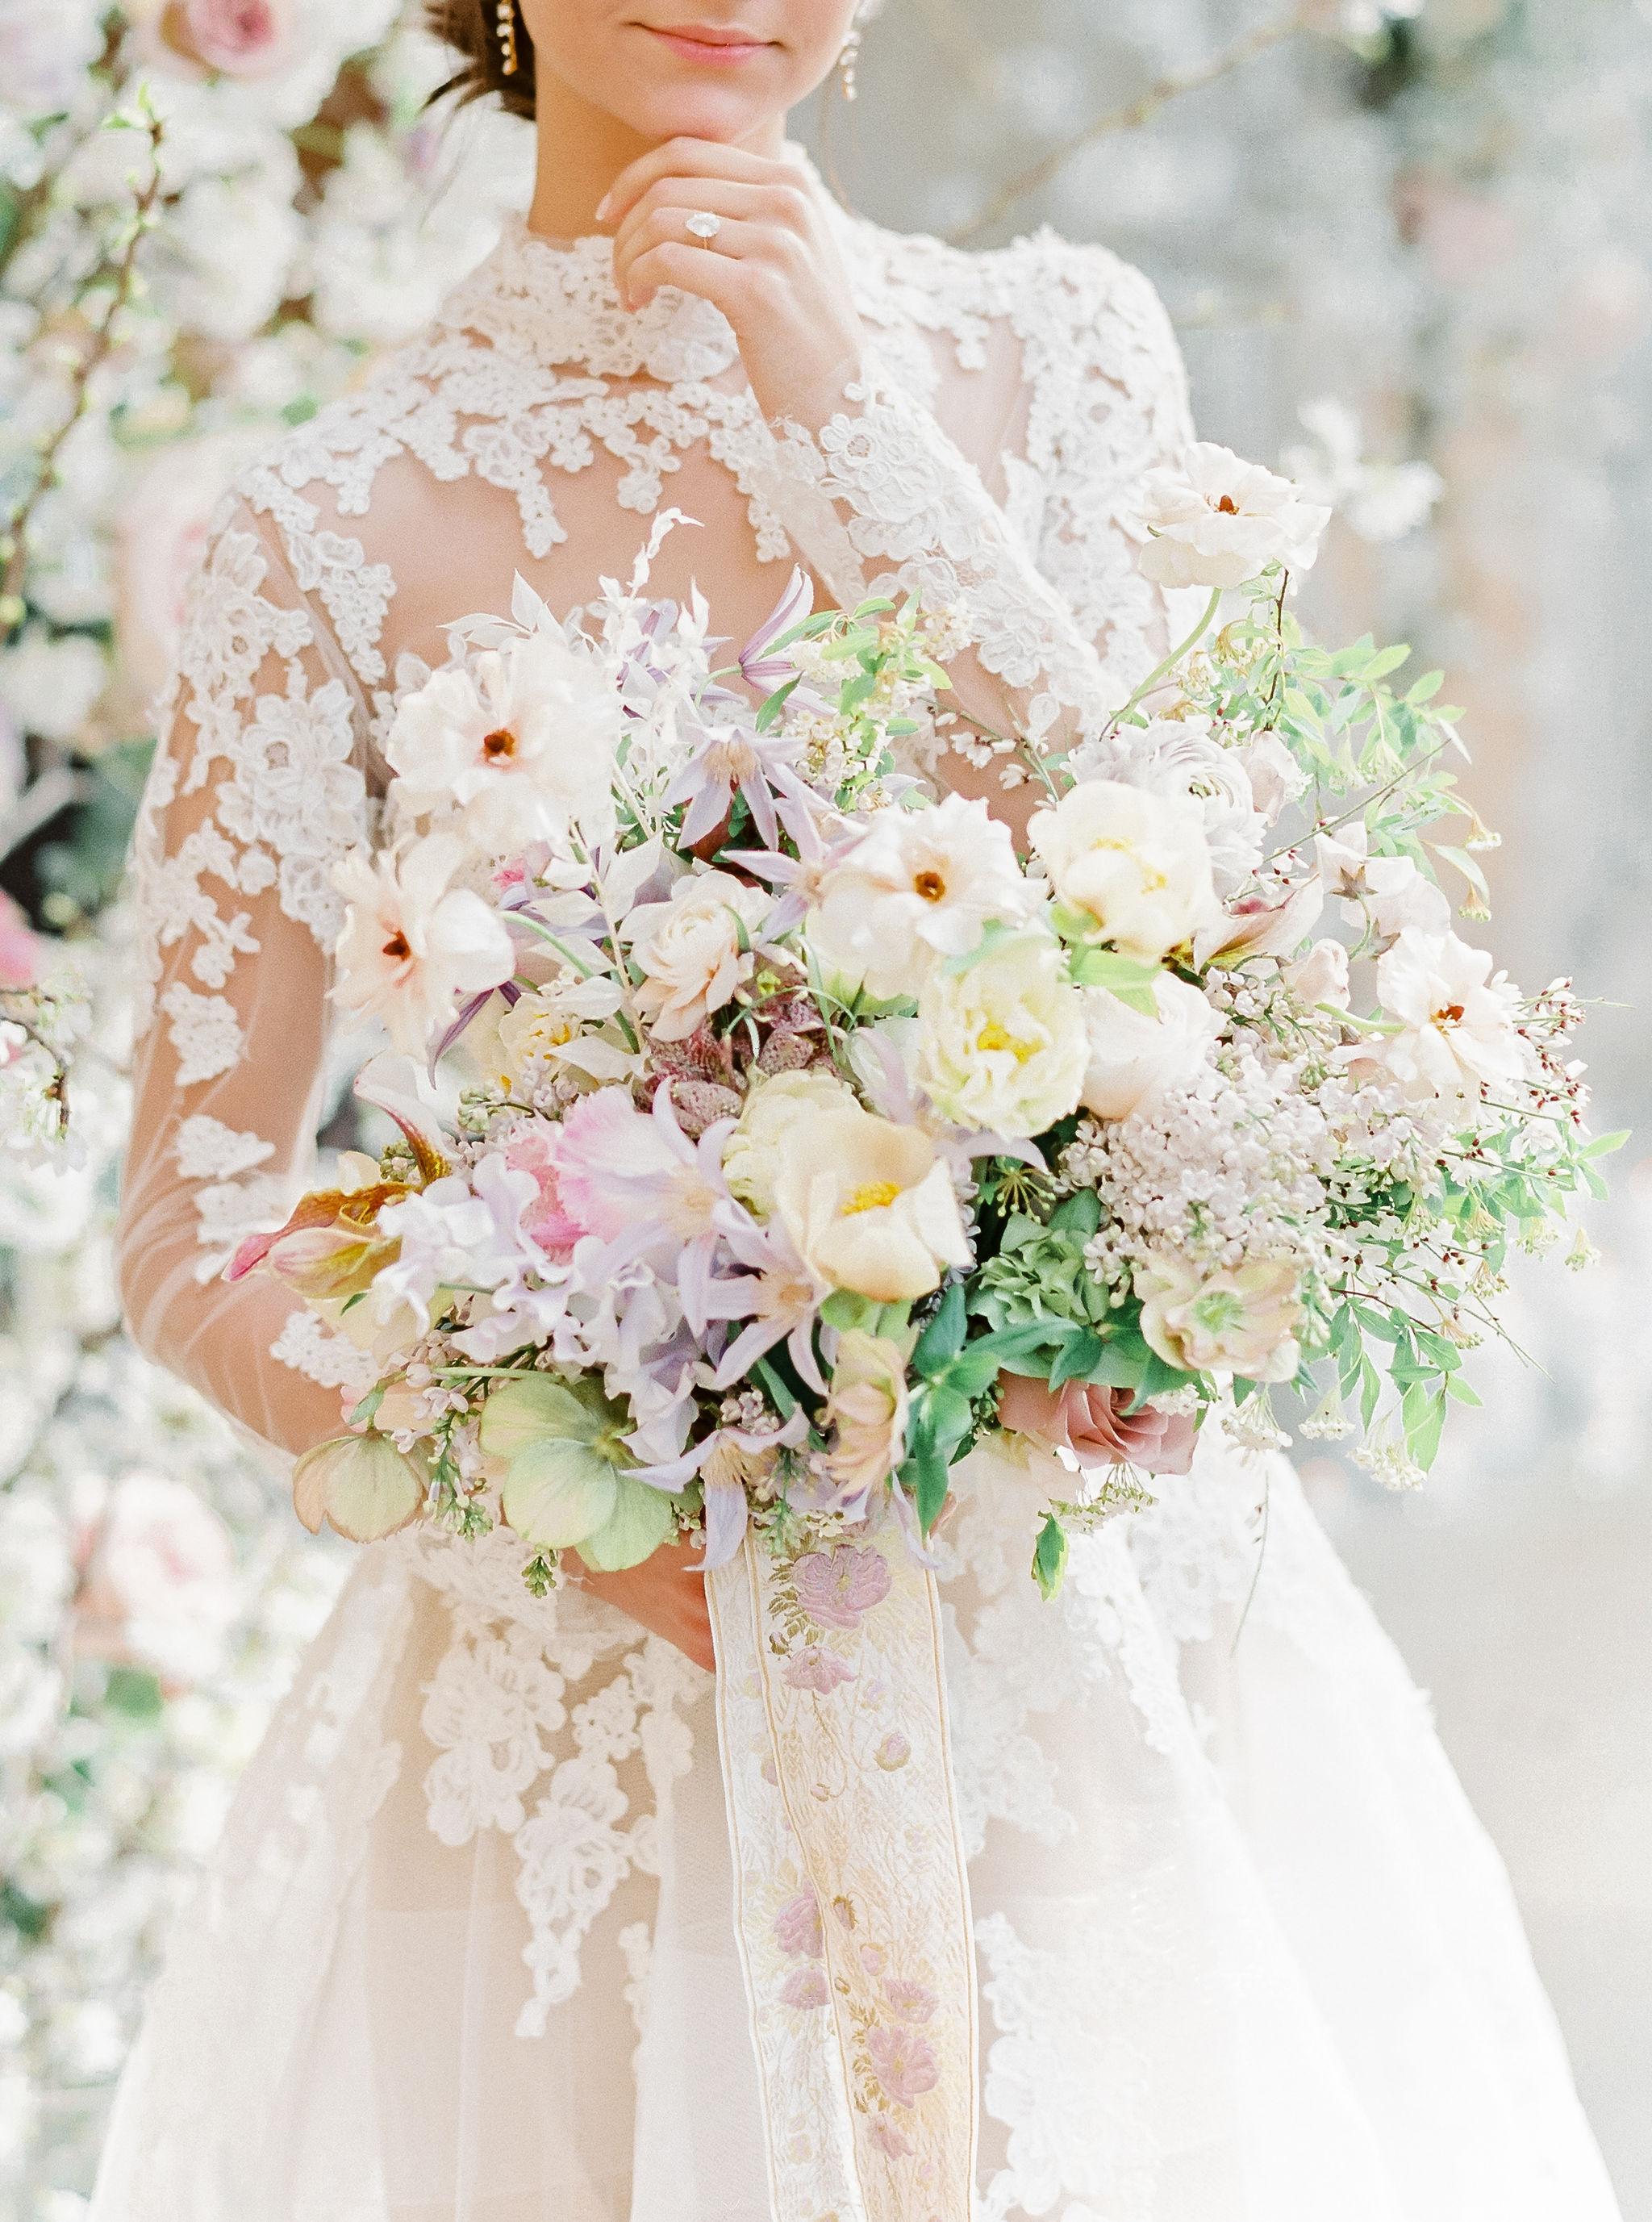 Lauren Fair and East Made Co Wedding Film Photography Workshop at Cairnwood Estate_076.jpg